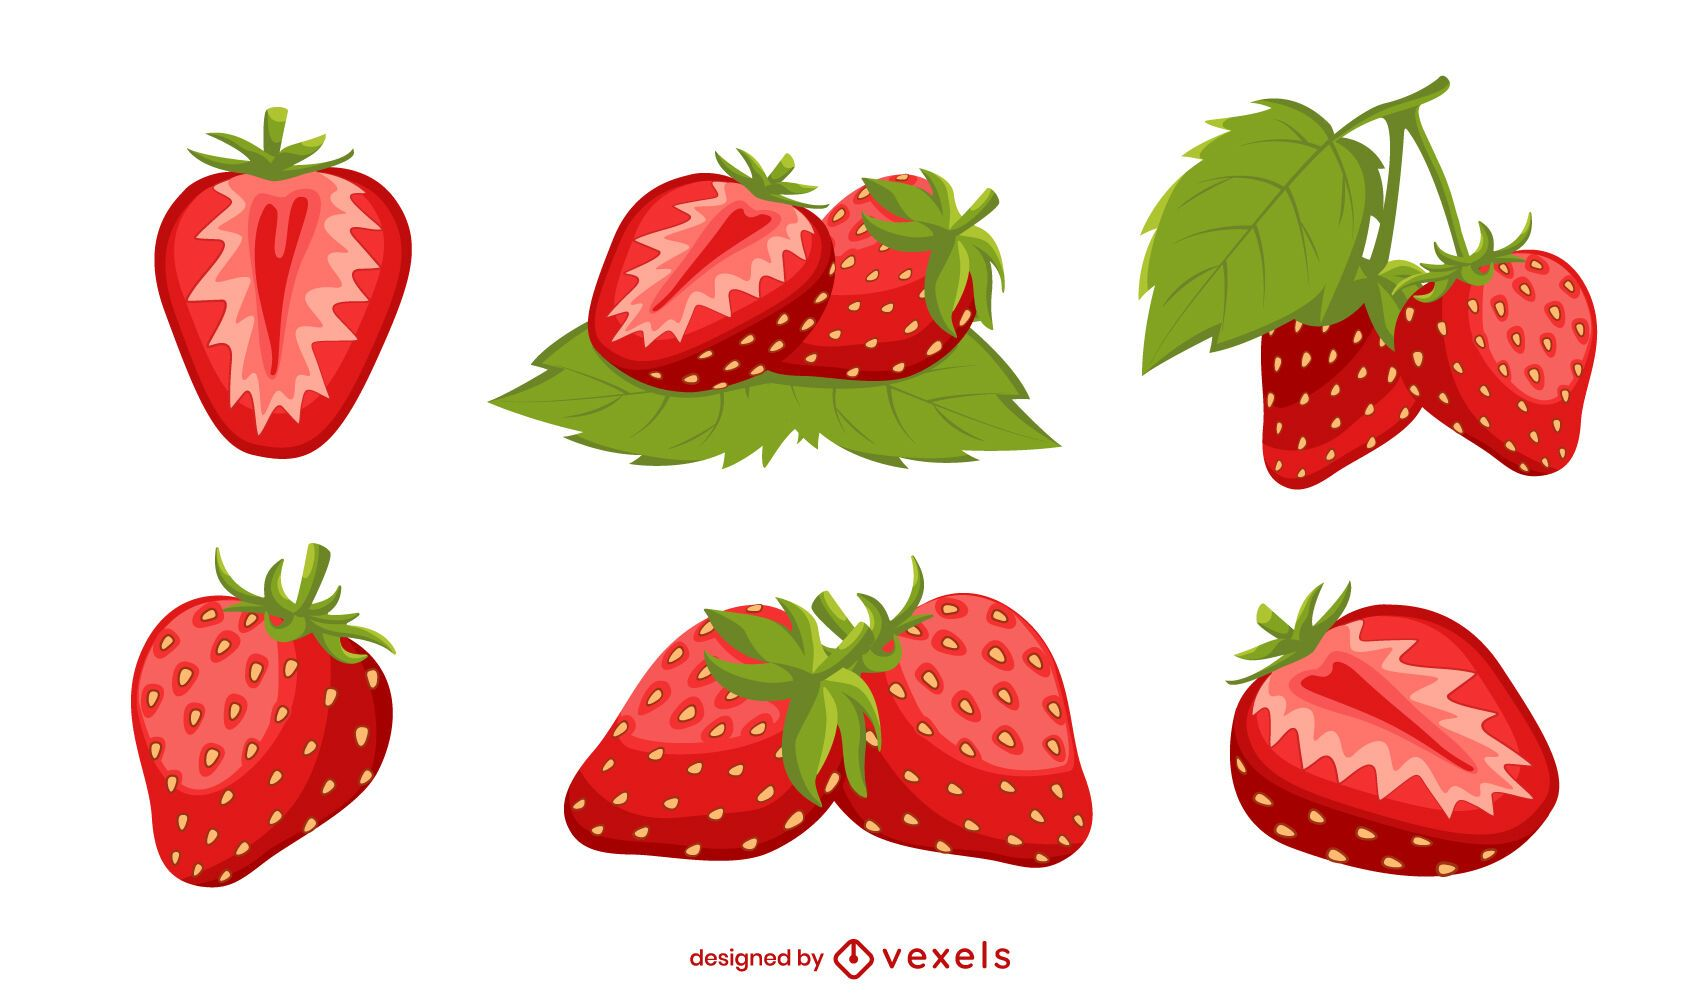 Strawberry detailed illustration set